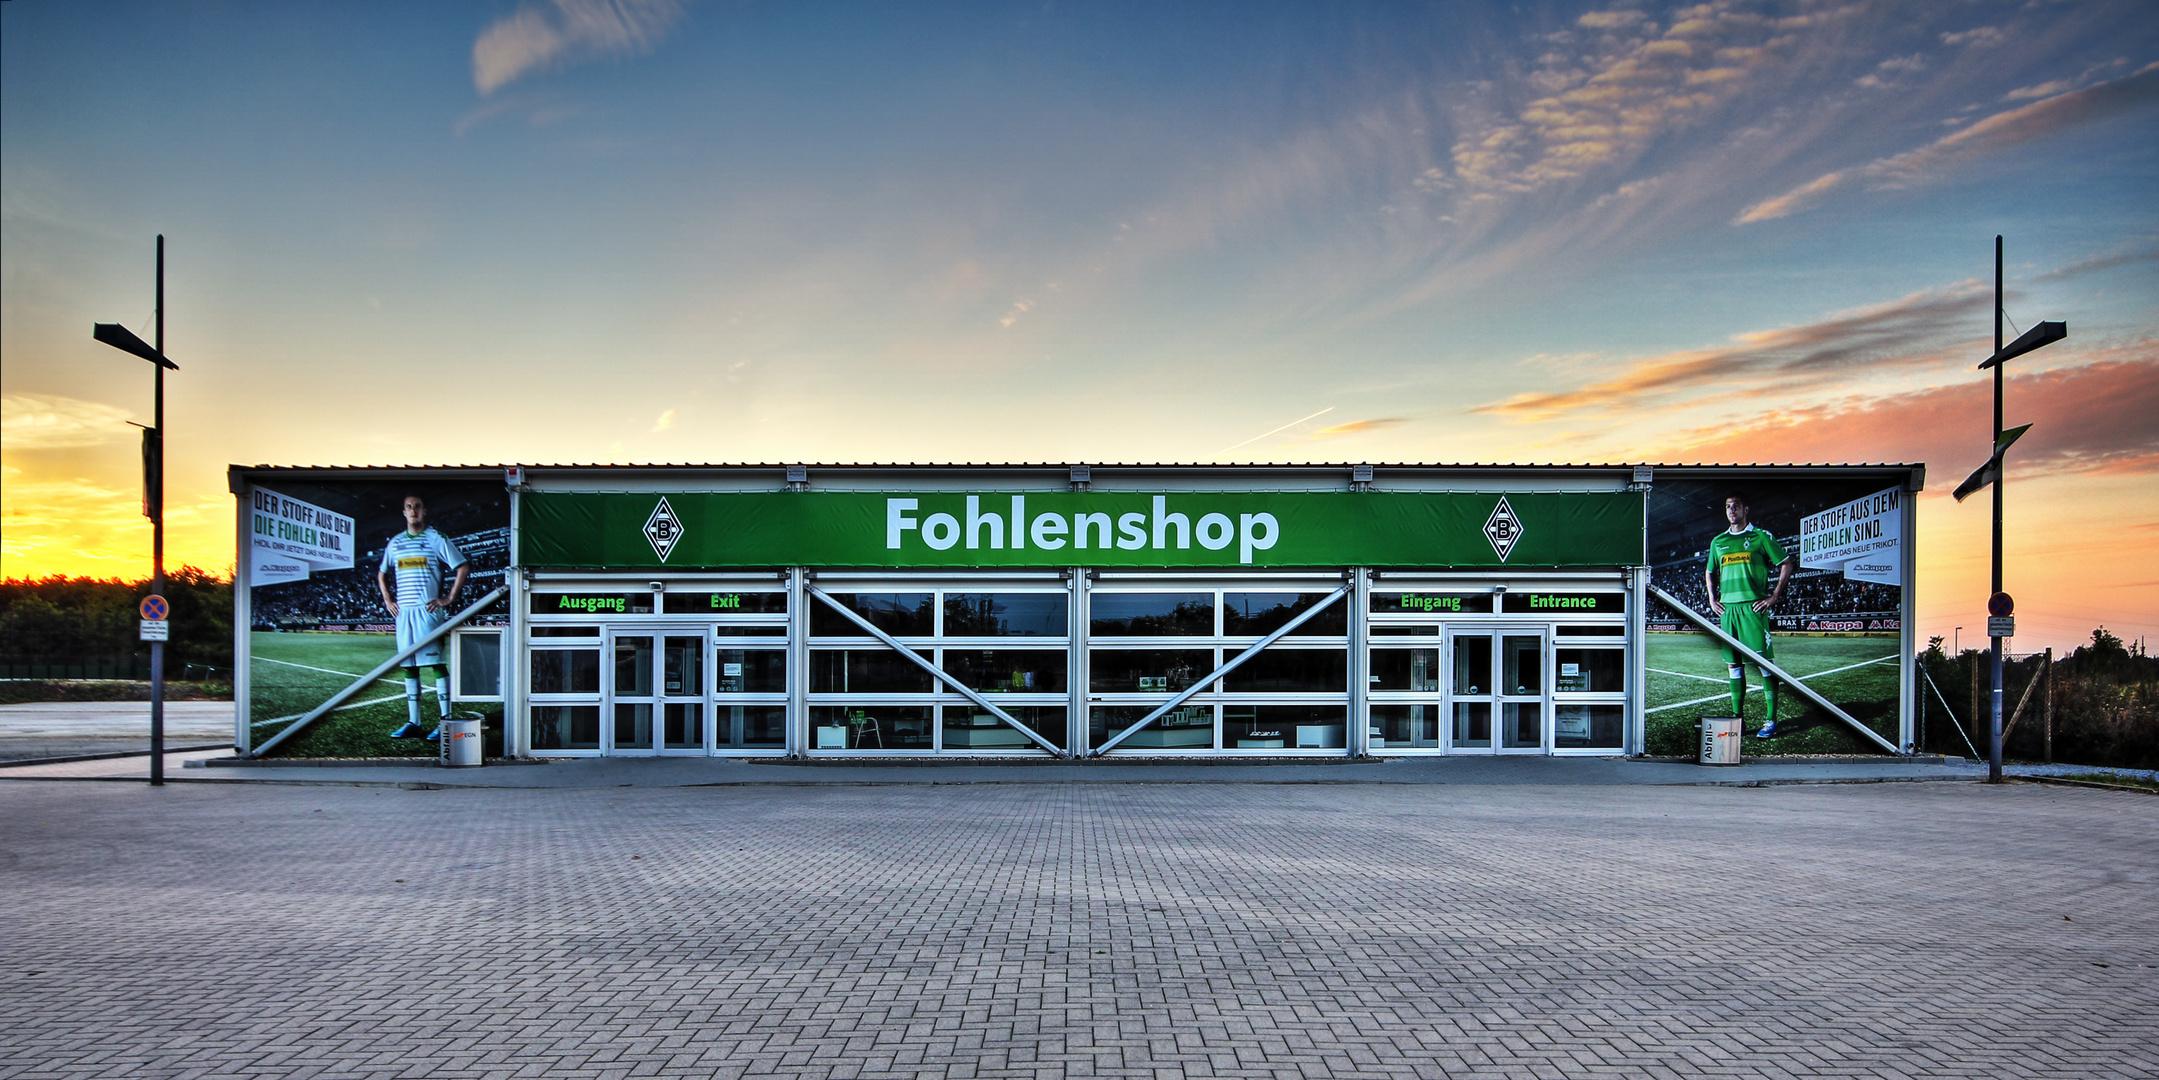 Fohlenshop Gladbach